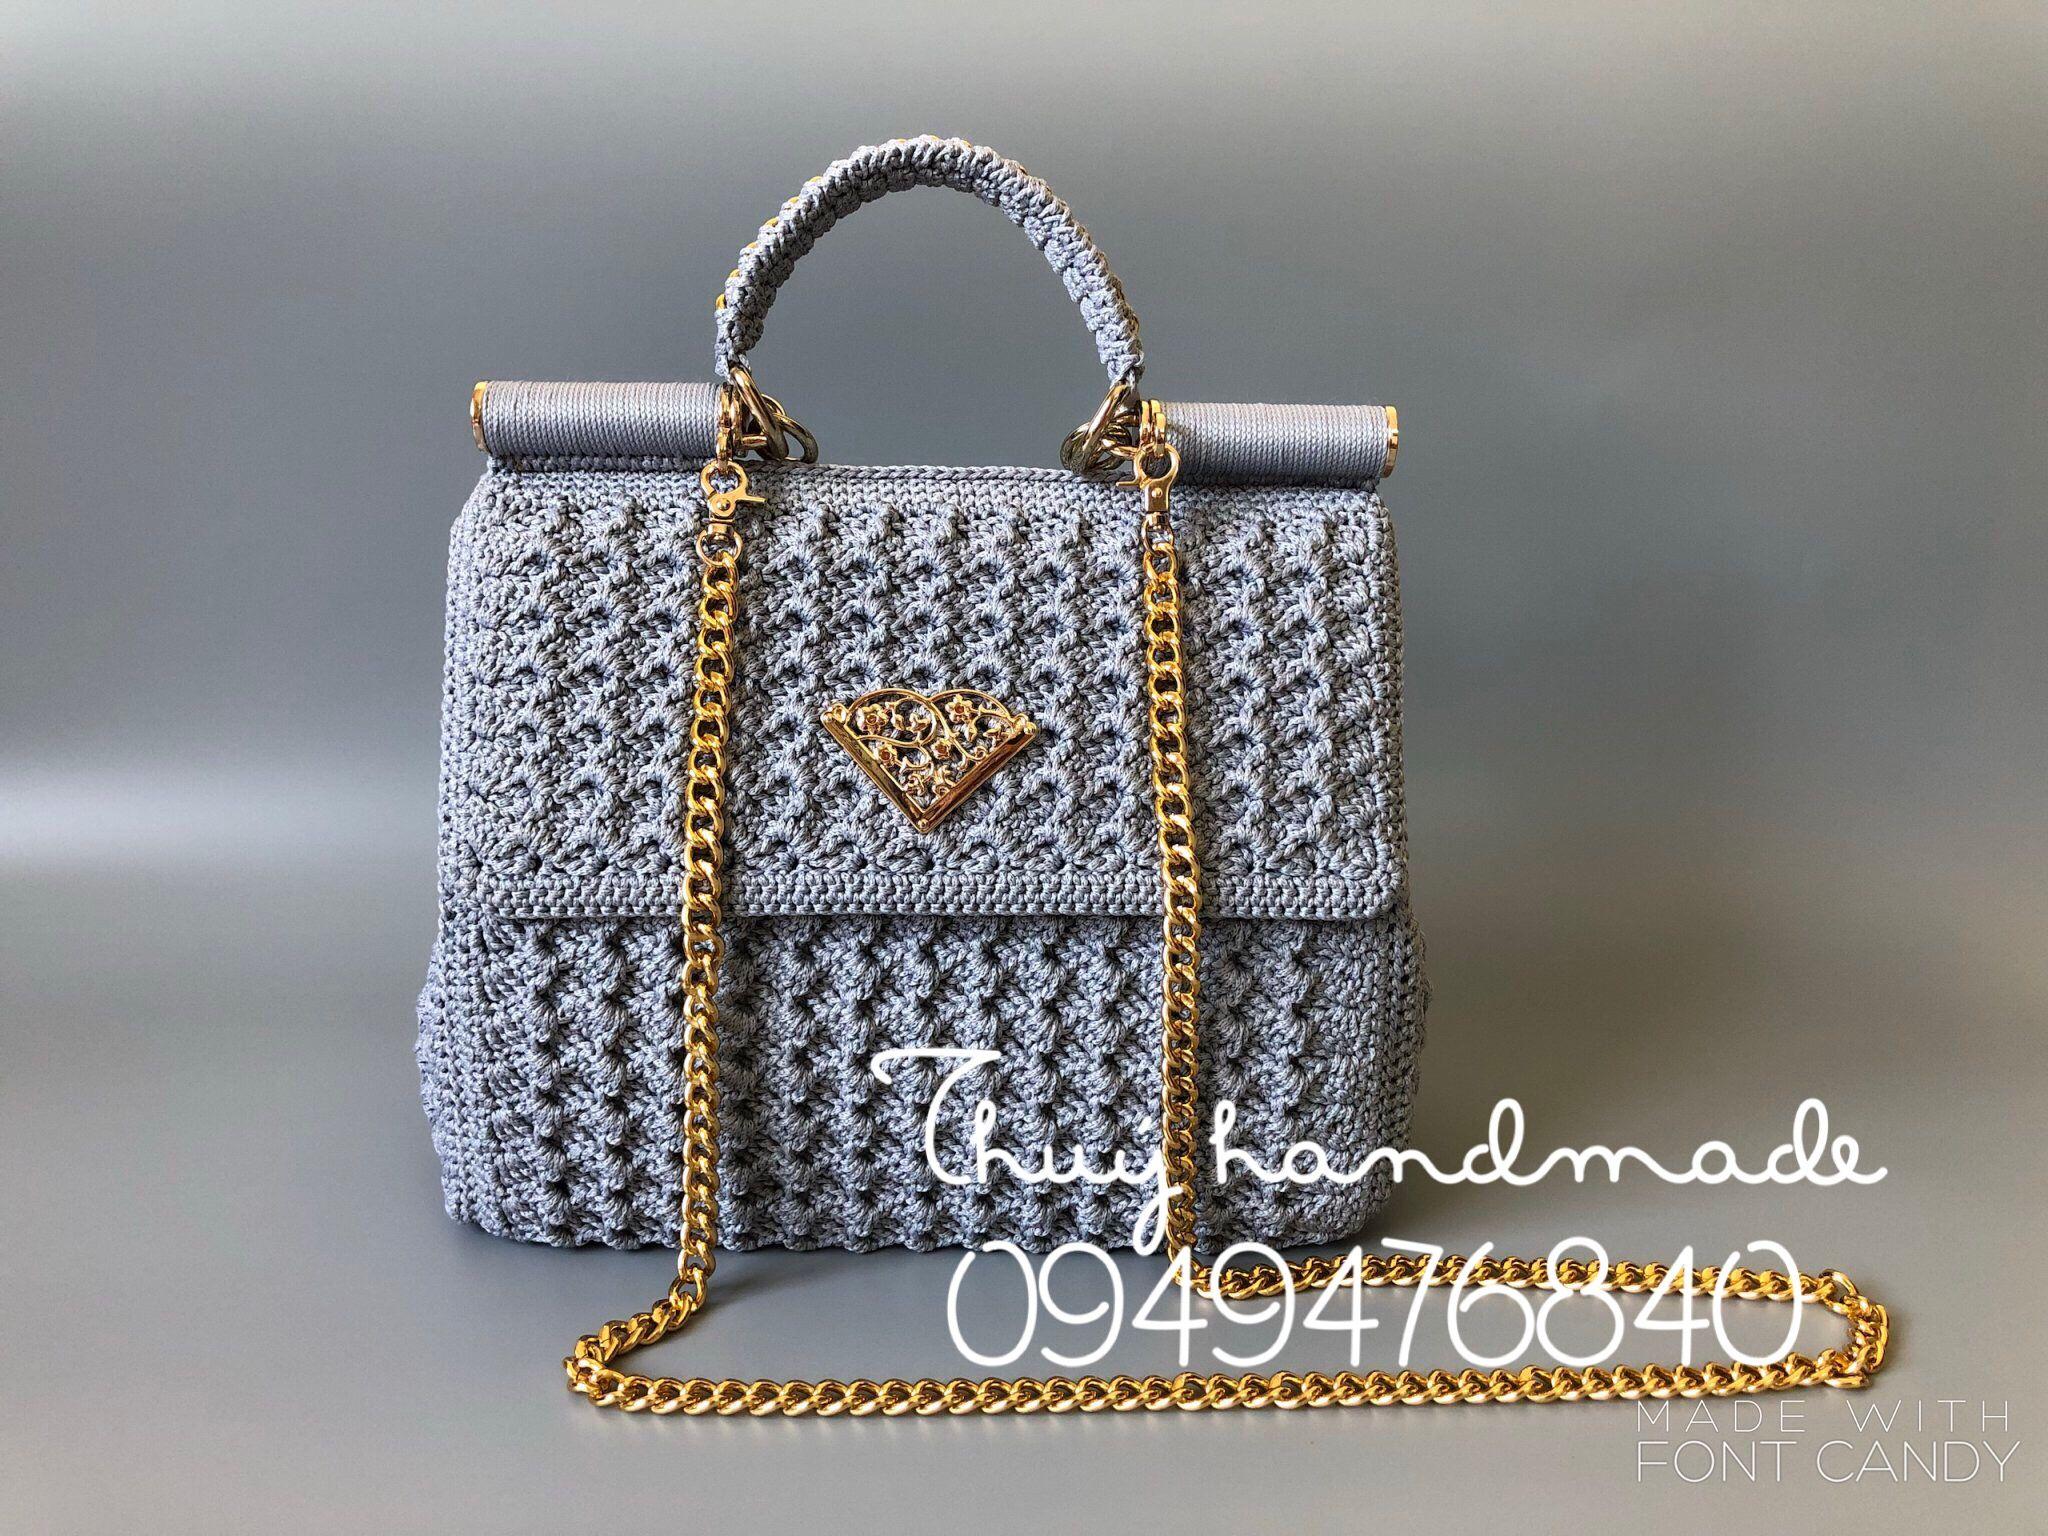 Pin By Yessi On Crochet Handmade Bag Crochet Bag Handmade Bags Bags